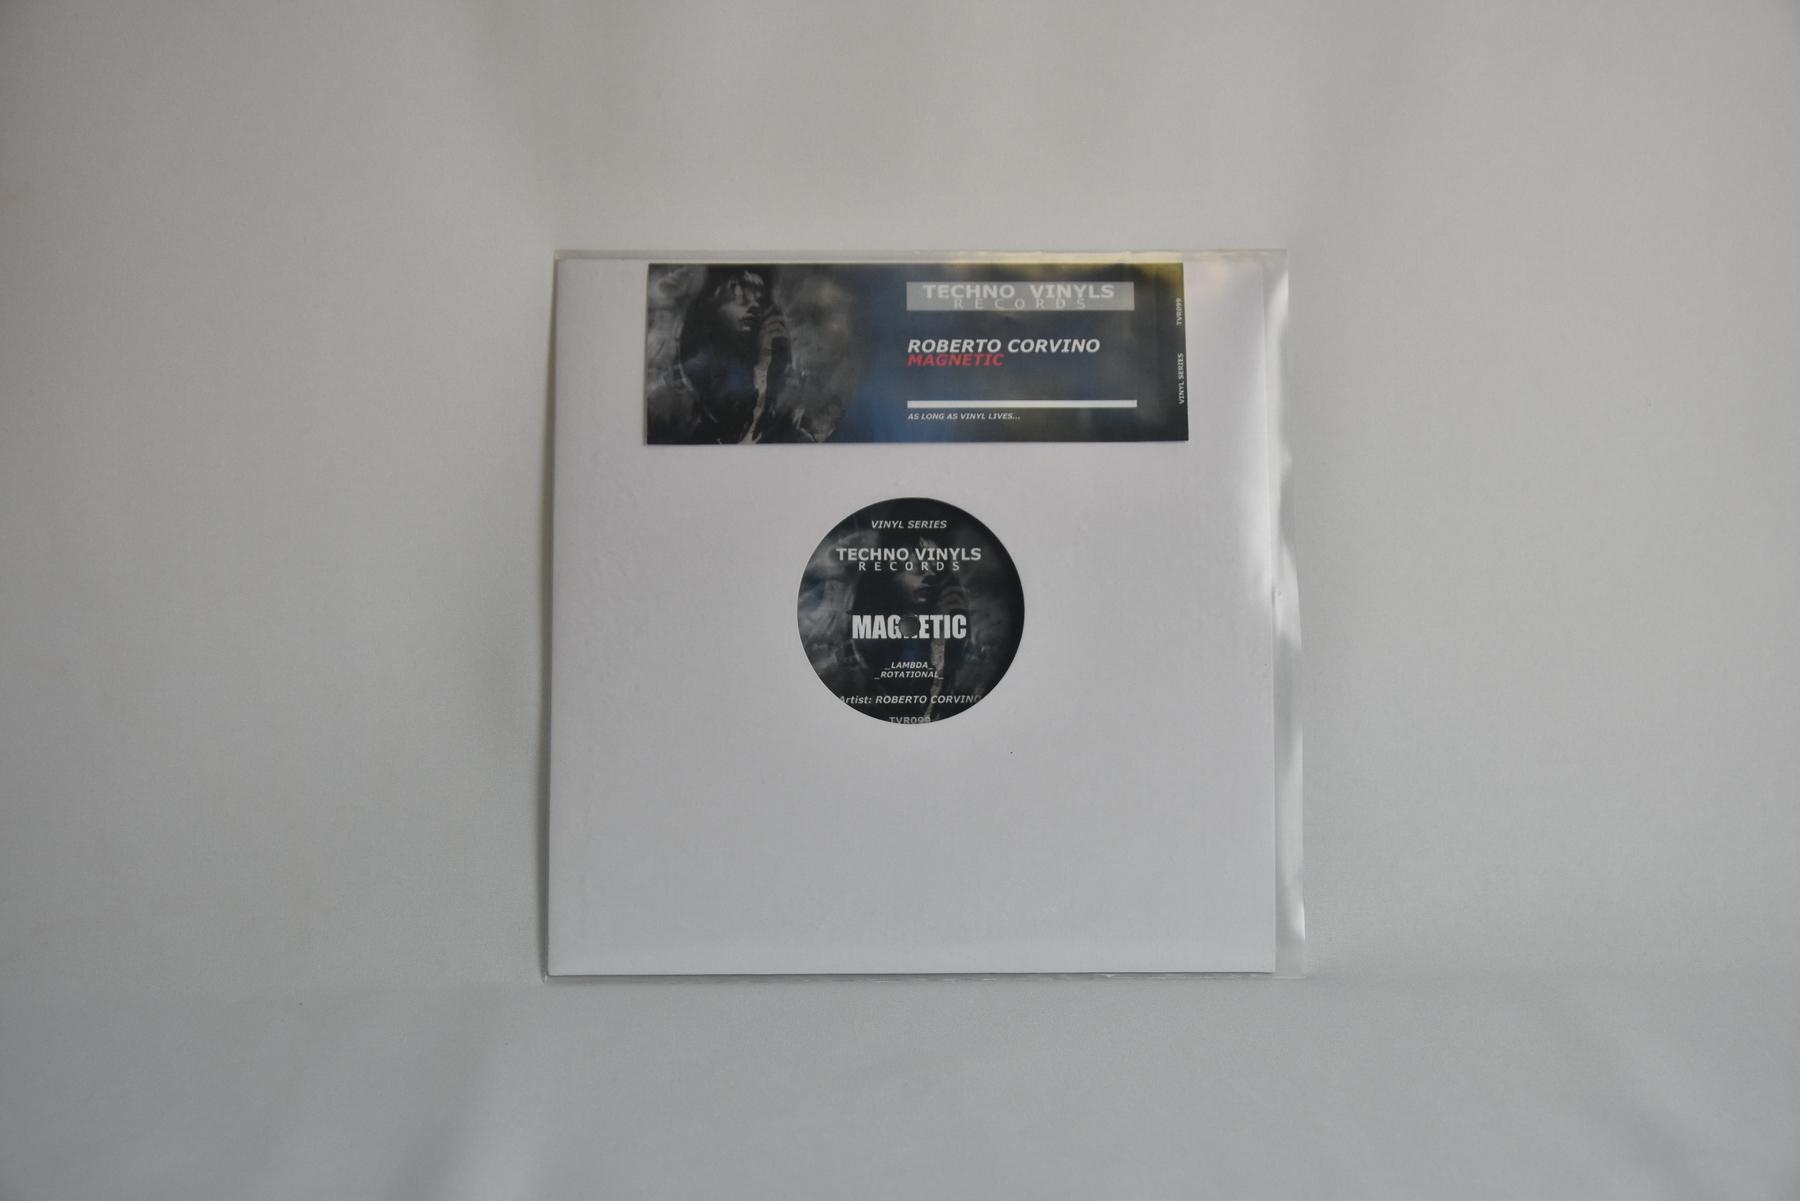 Roberto Corvino – Magnetic EP